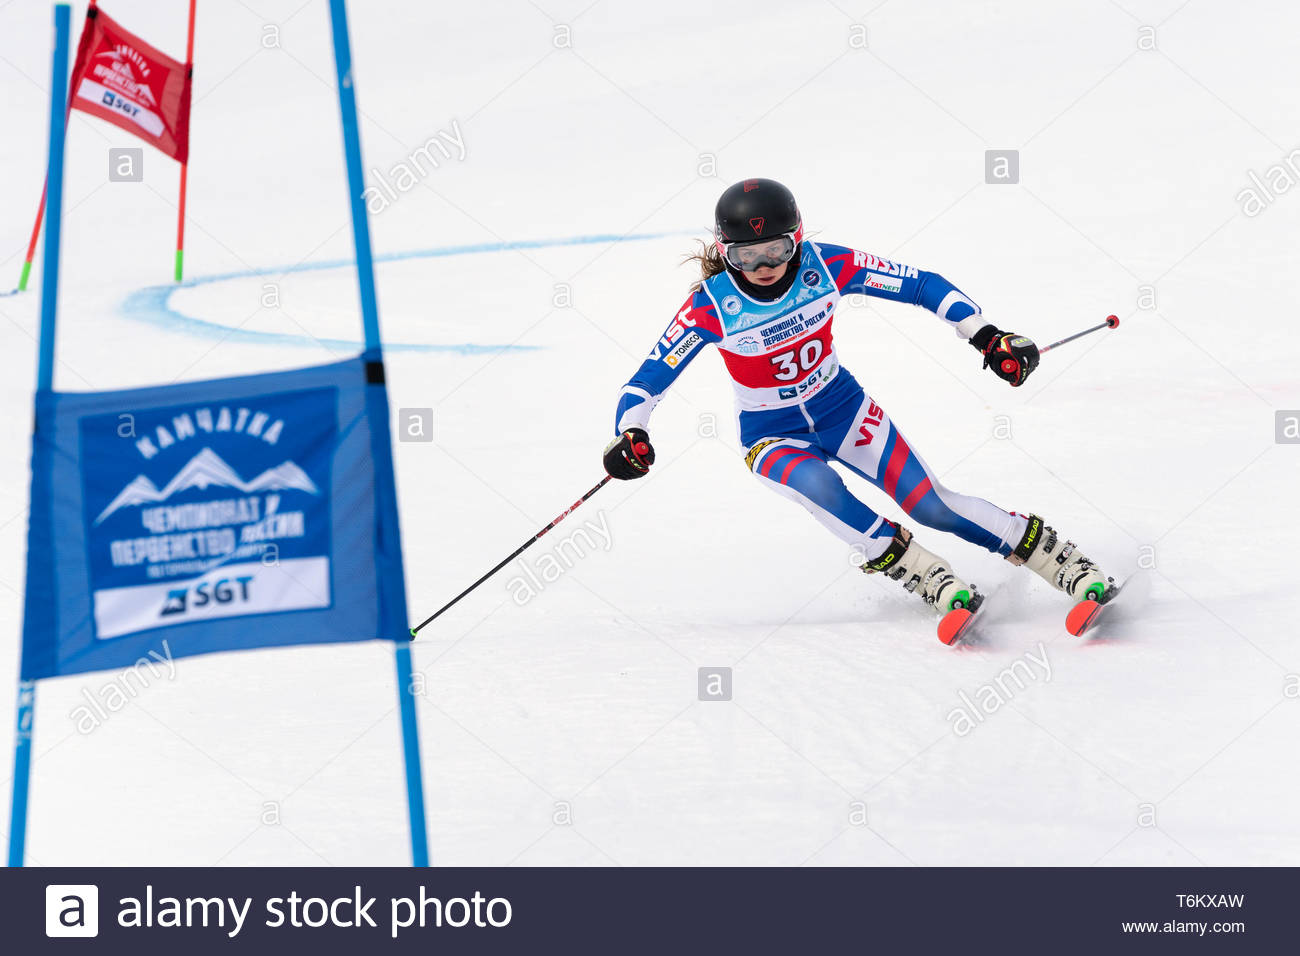 KAMCHATKA PENINSULA, RUSSIA - APRIL 2, 2019: Mountain skier Lendya Ulyana (Kamchatka) skiing down mount slope. Russian Women's Alpine Skiing Cup, Inte - Stock Image